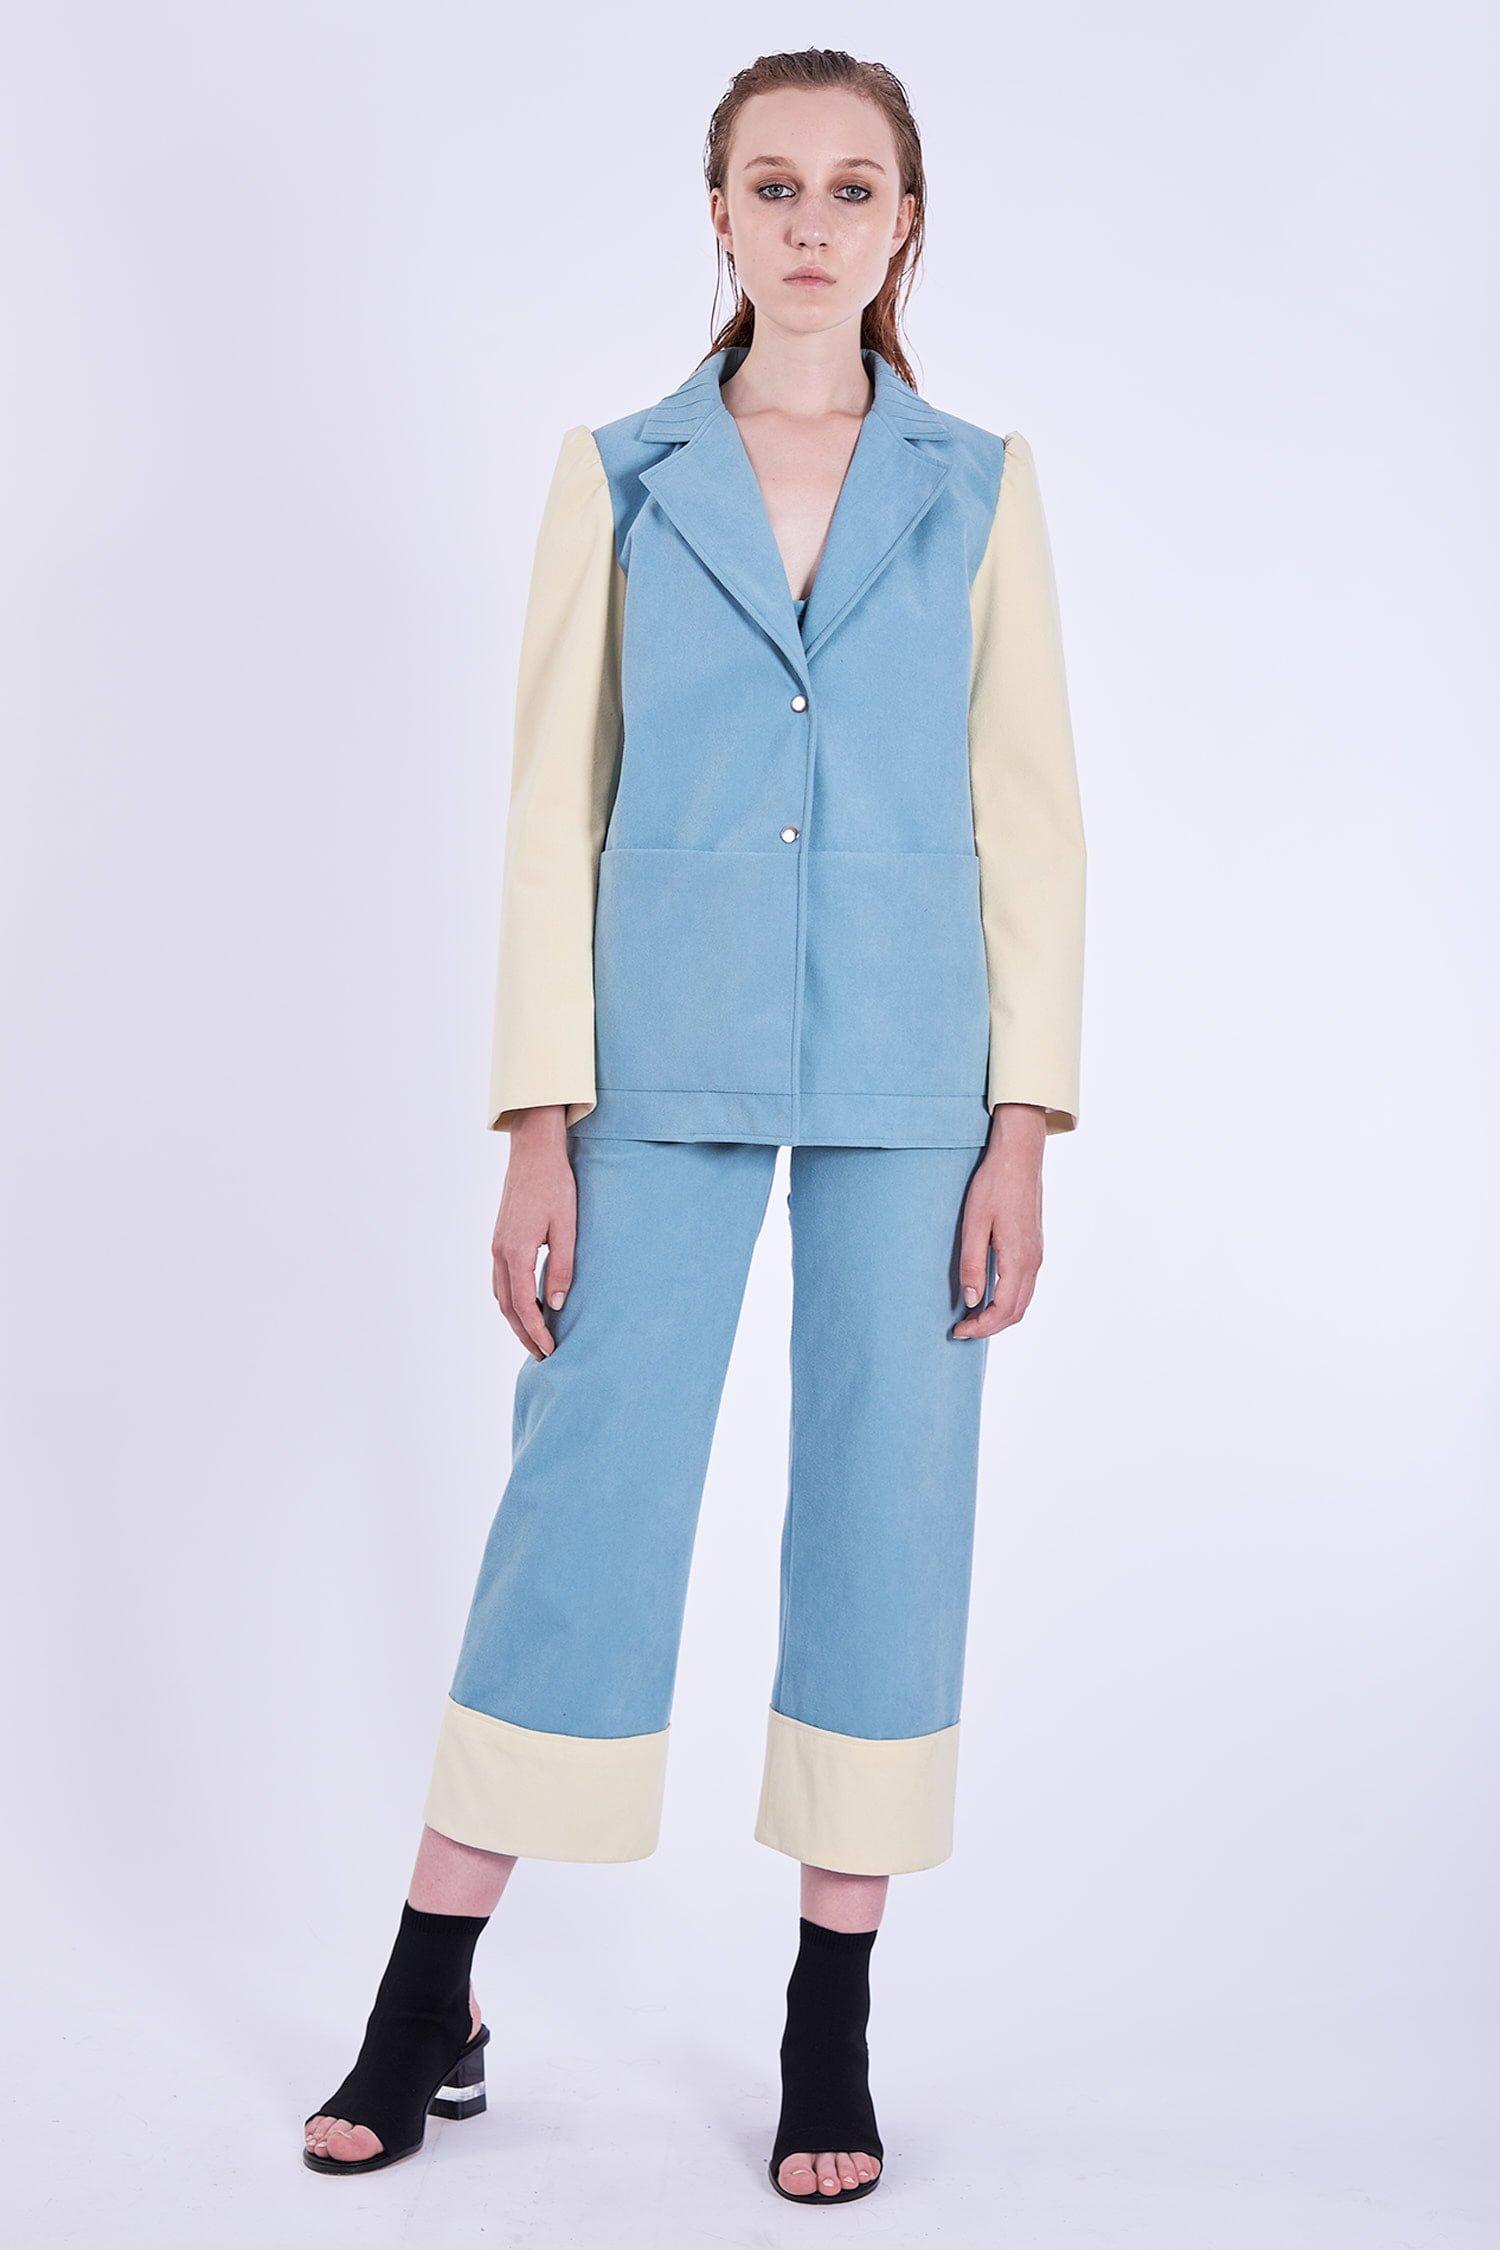 Acephala Ps2020 Blue Suit Suade Alcantara Blekitny Garnitur Front 2